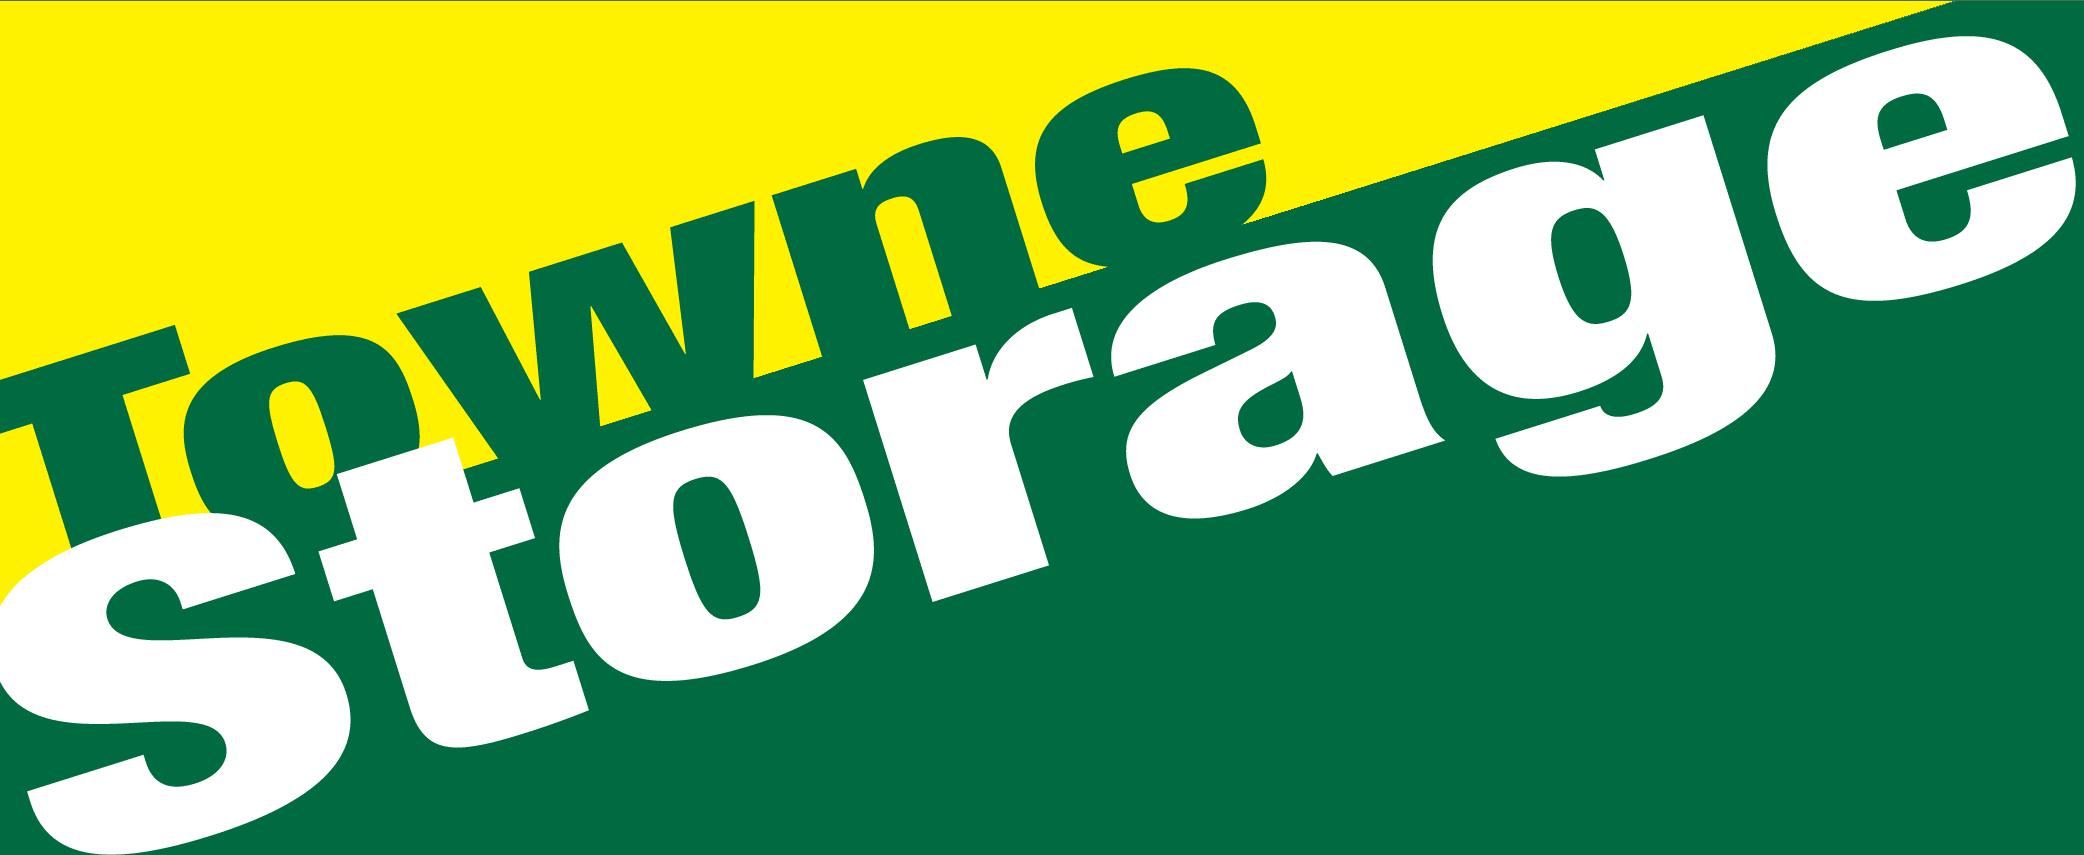 Towne Storage - Woods Cross logo